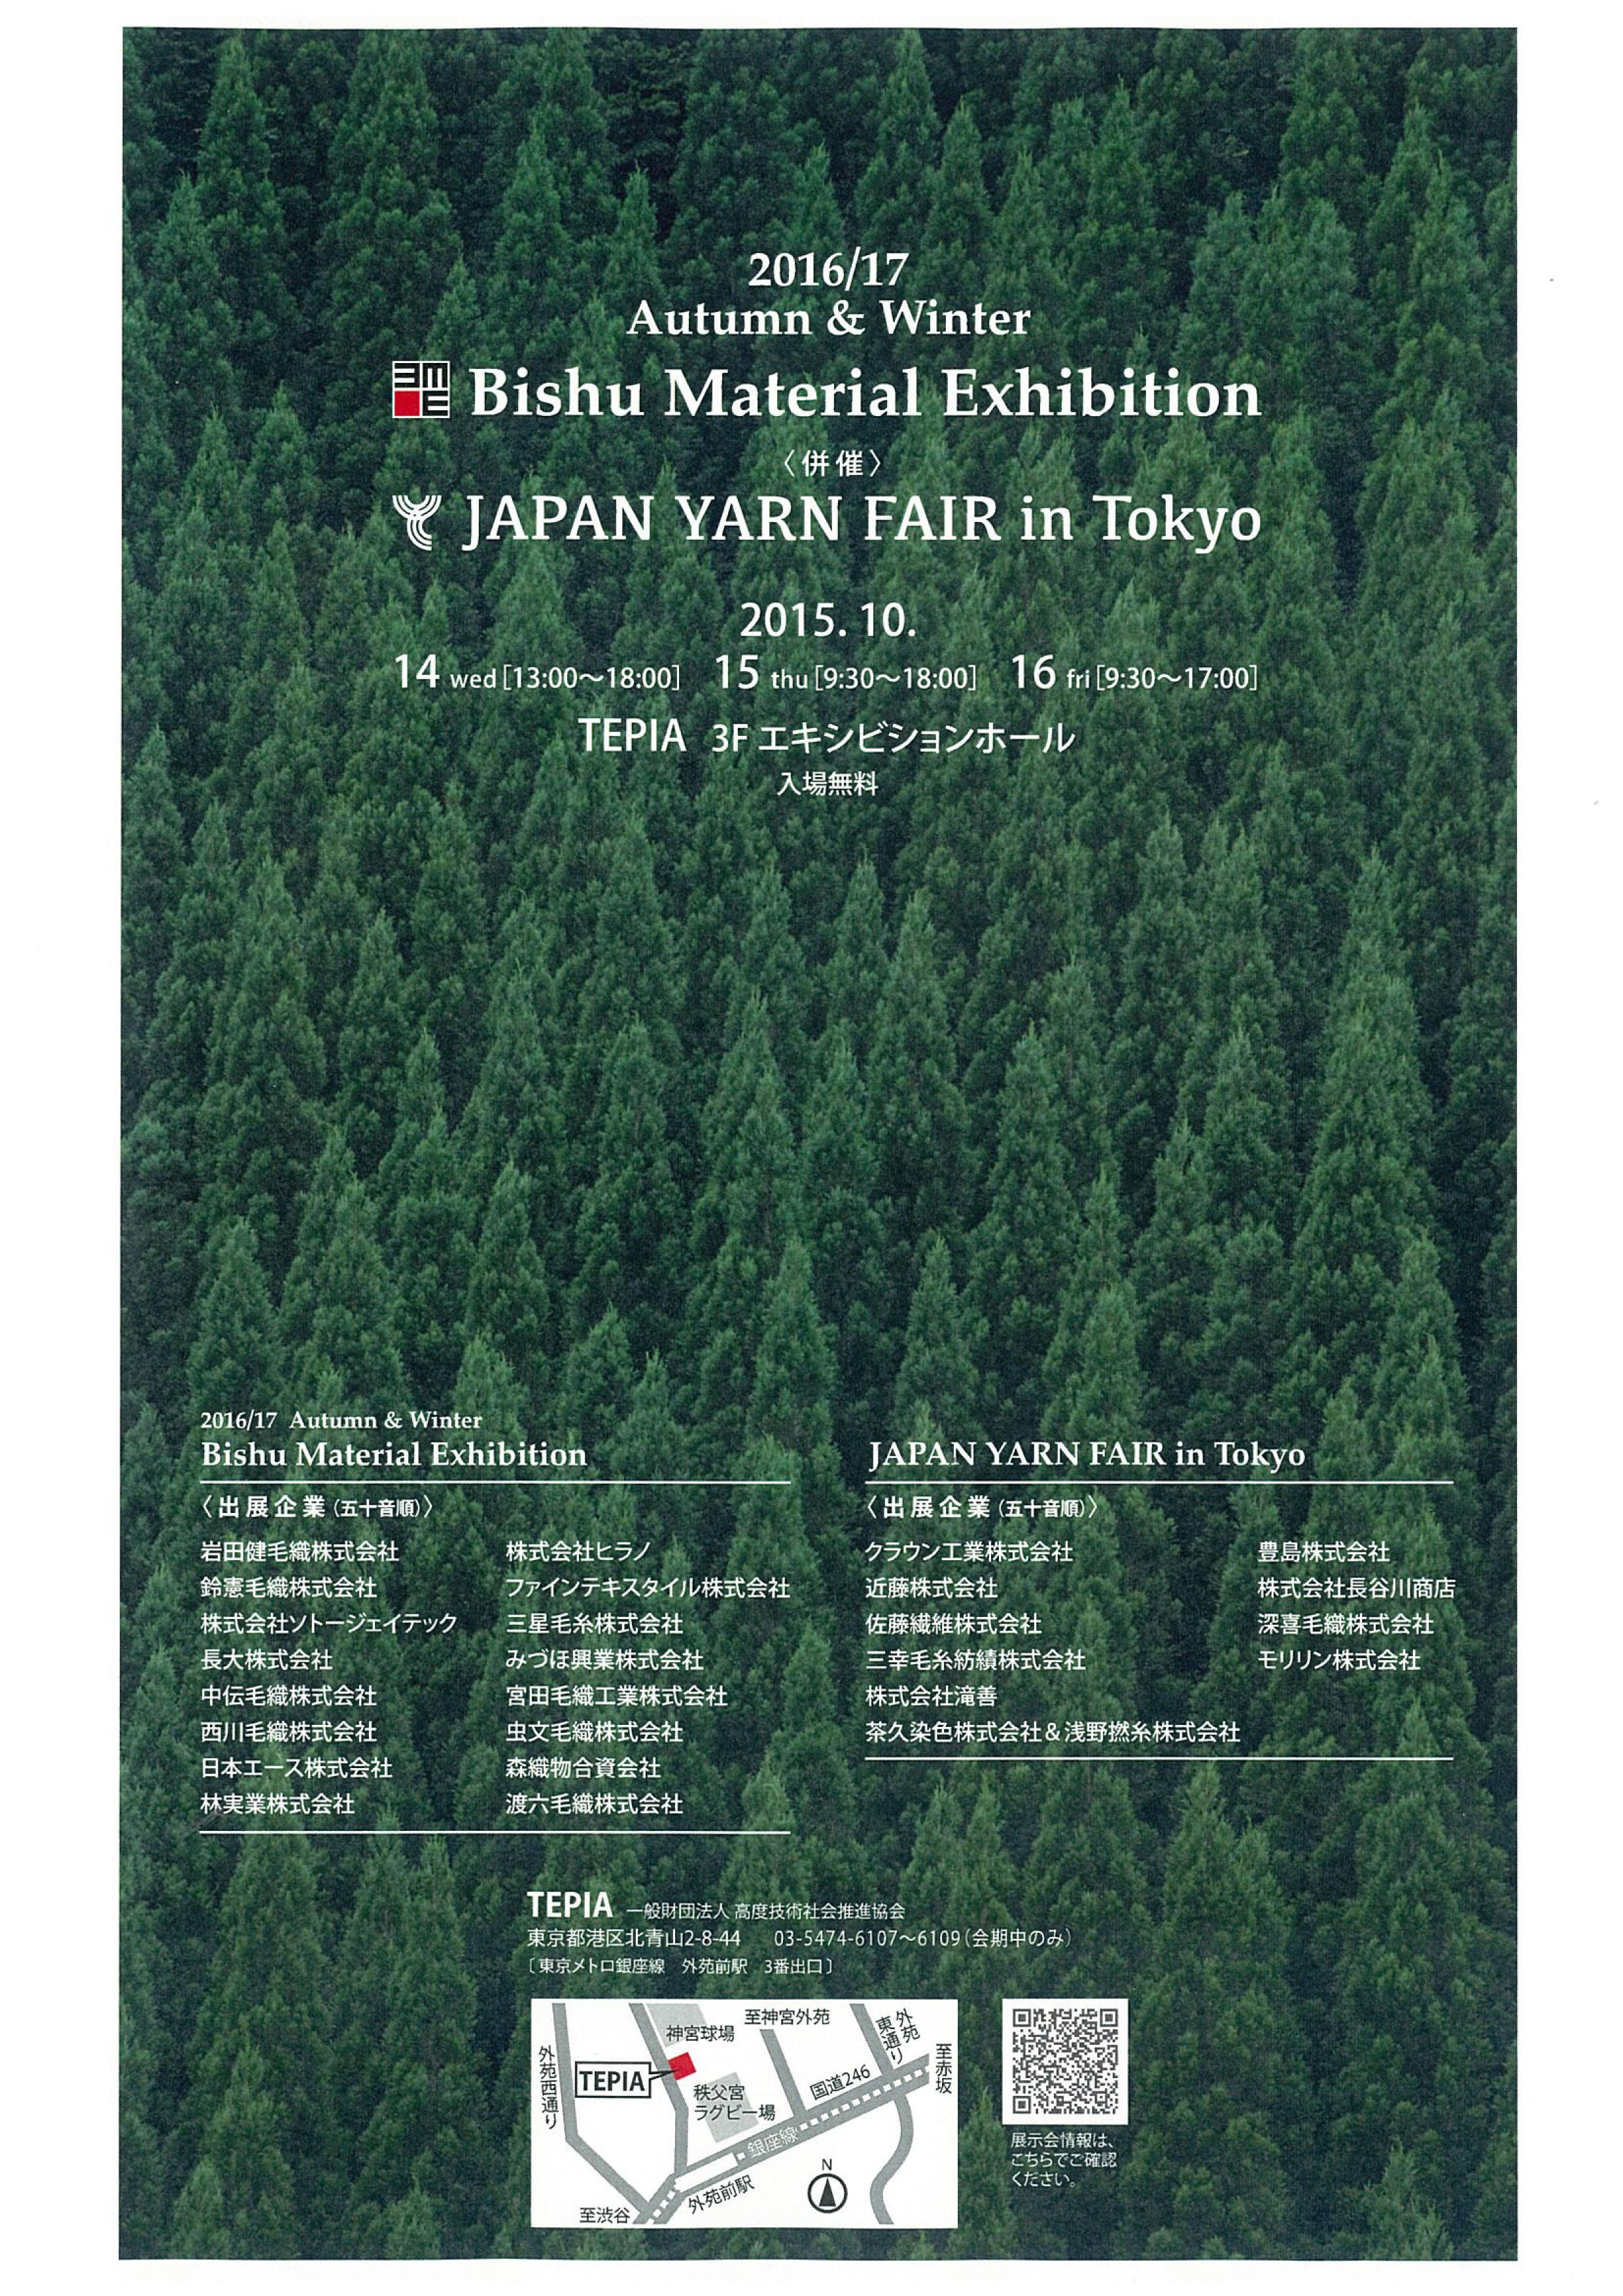 JAPAN YARN FAIR in Tokyo  糸の展示商談会のお知らせの写真